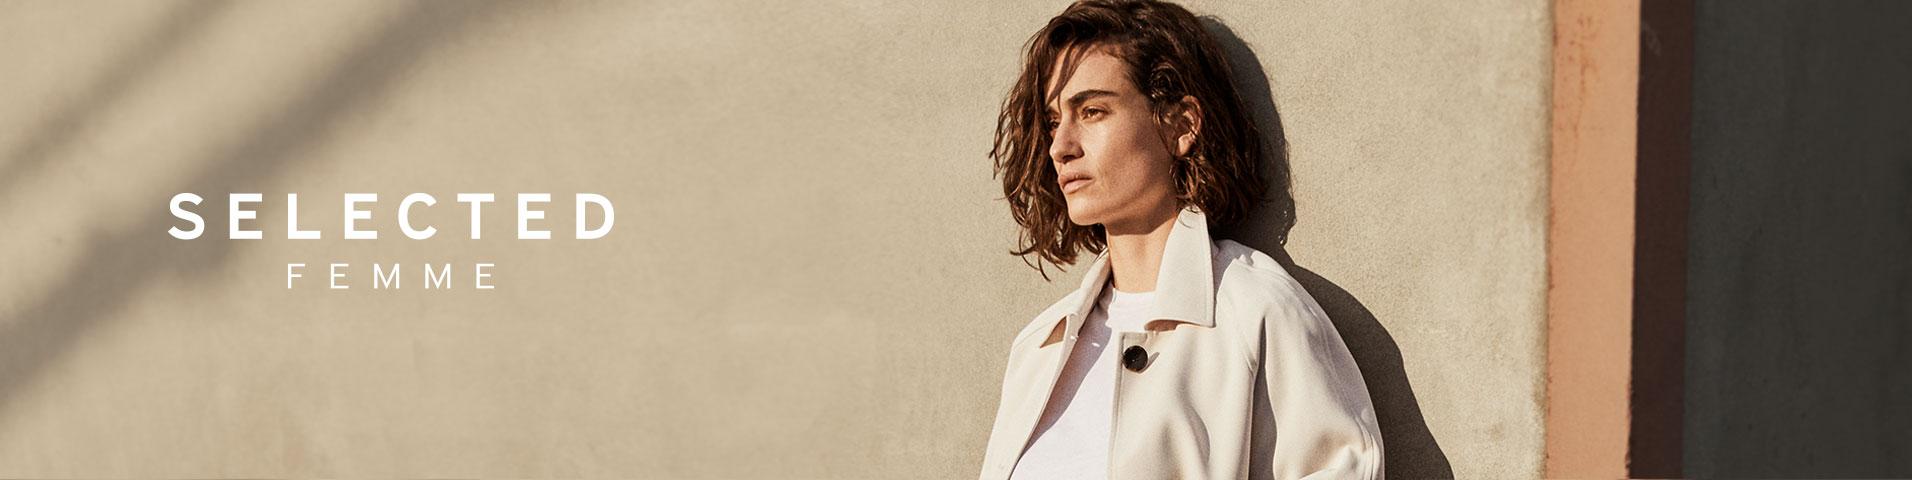 c8e6a7bfa6ce3f Selected Femme Online Shop | Selected Femme online bestellen bei Zalando